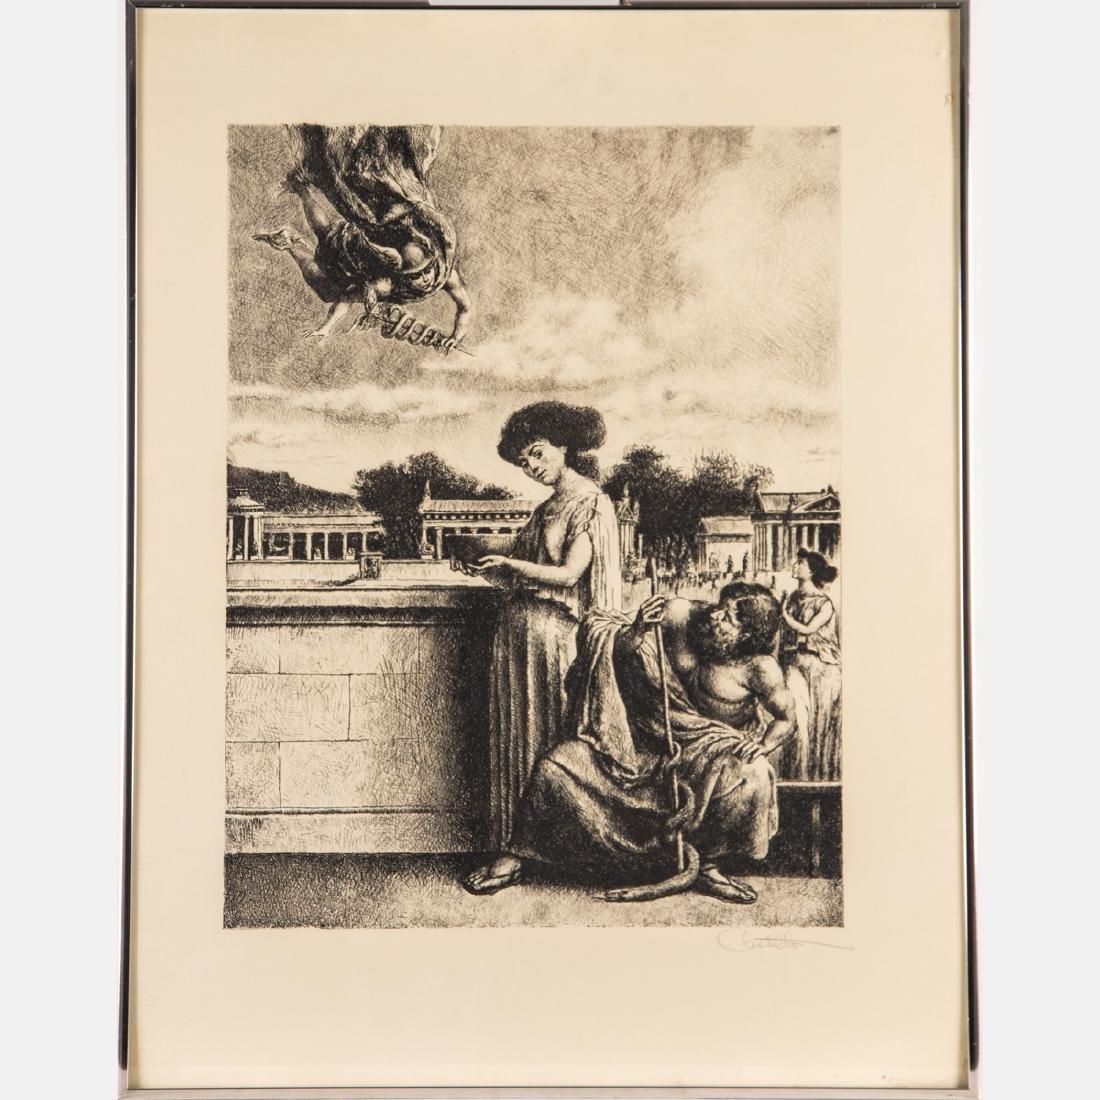 Federico Castellon (1914-1971) Hermes and Panacea, - 2